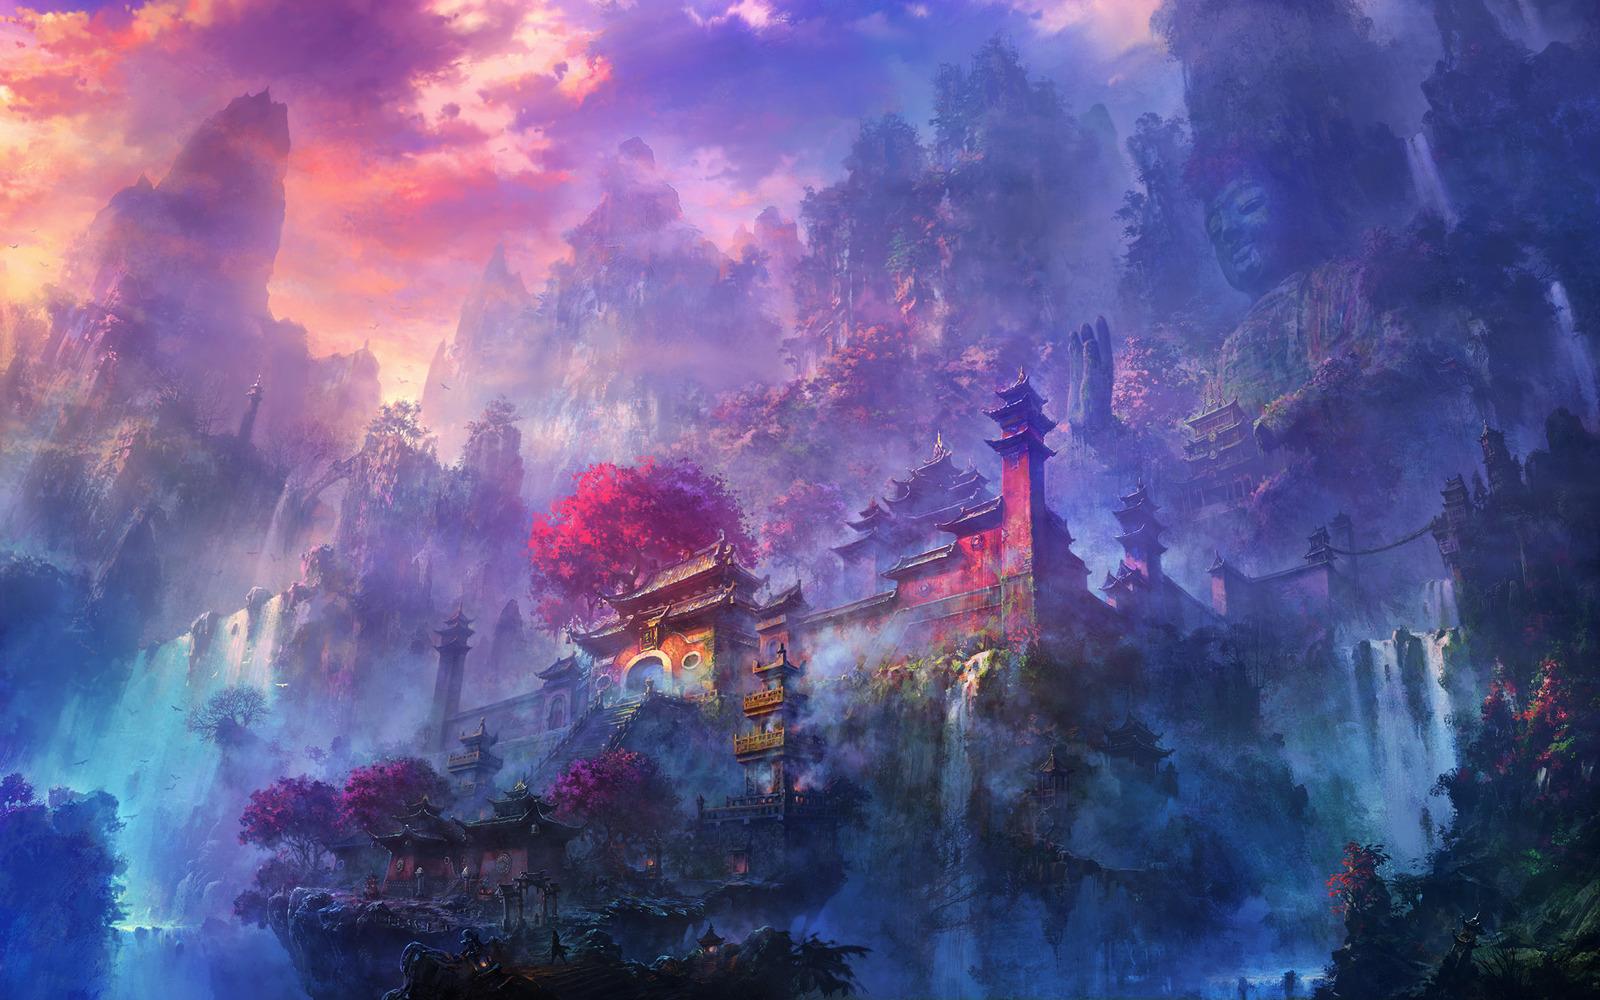 Stunning Hd Fantasy Gaming Desktop Wallpapers: Visit The Fascinating Fantasy Worlds Of Li Shuxing